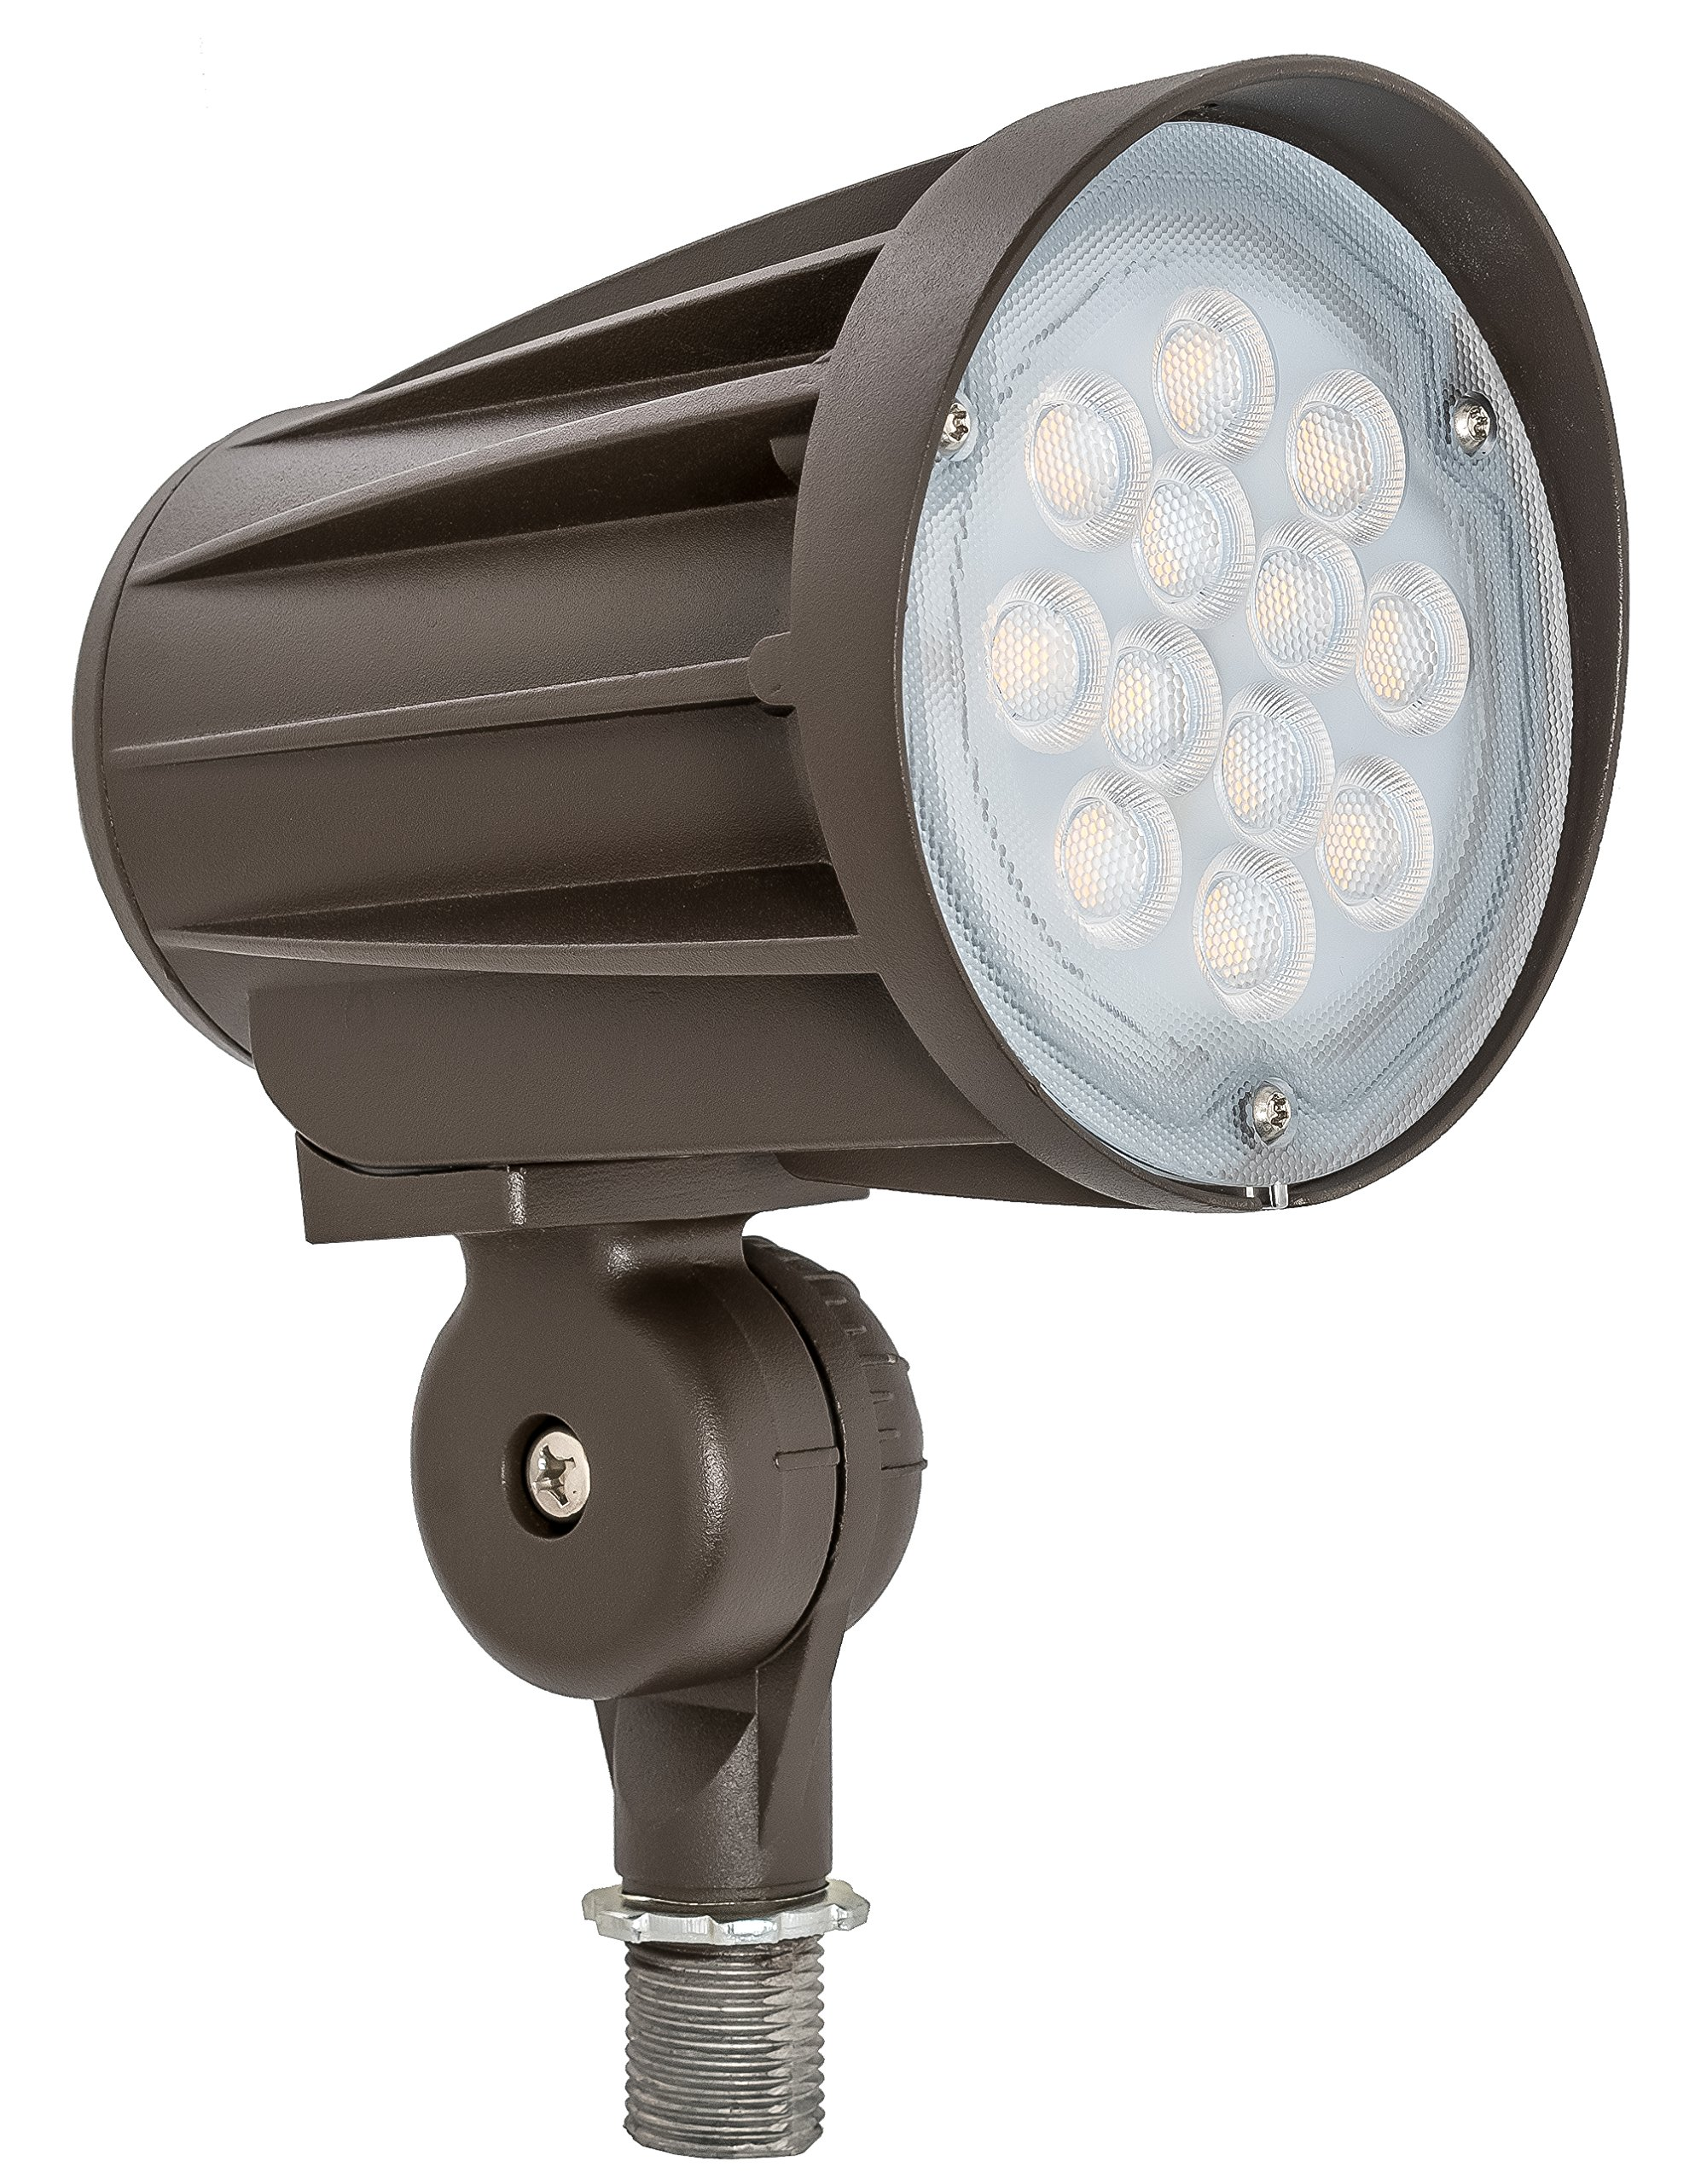 Westgate Lighting LED Outdoor Landscape Garden Bullet Flood Lights - Path Walkway Lawn Spotlights - Knuckle Mount - IP65 Waterproof - High Lumen - UL/DLC Listed - 120-277V (28W, 5000K Knuckle)